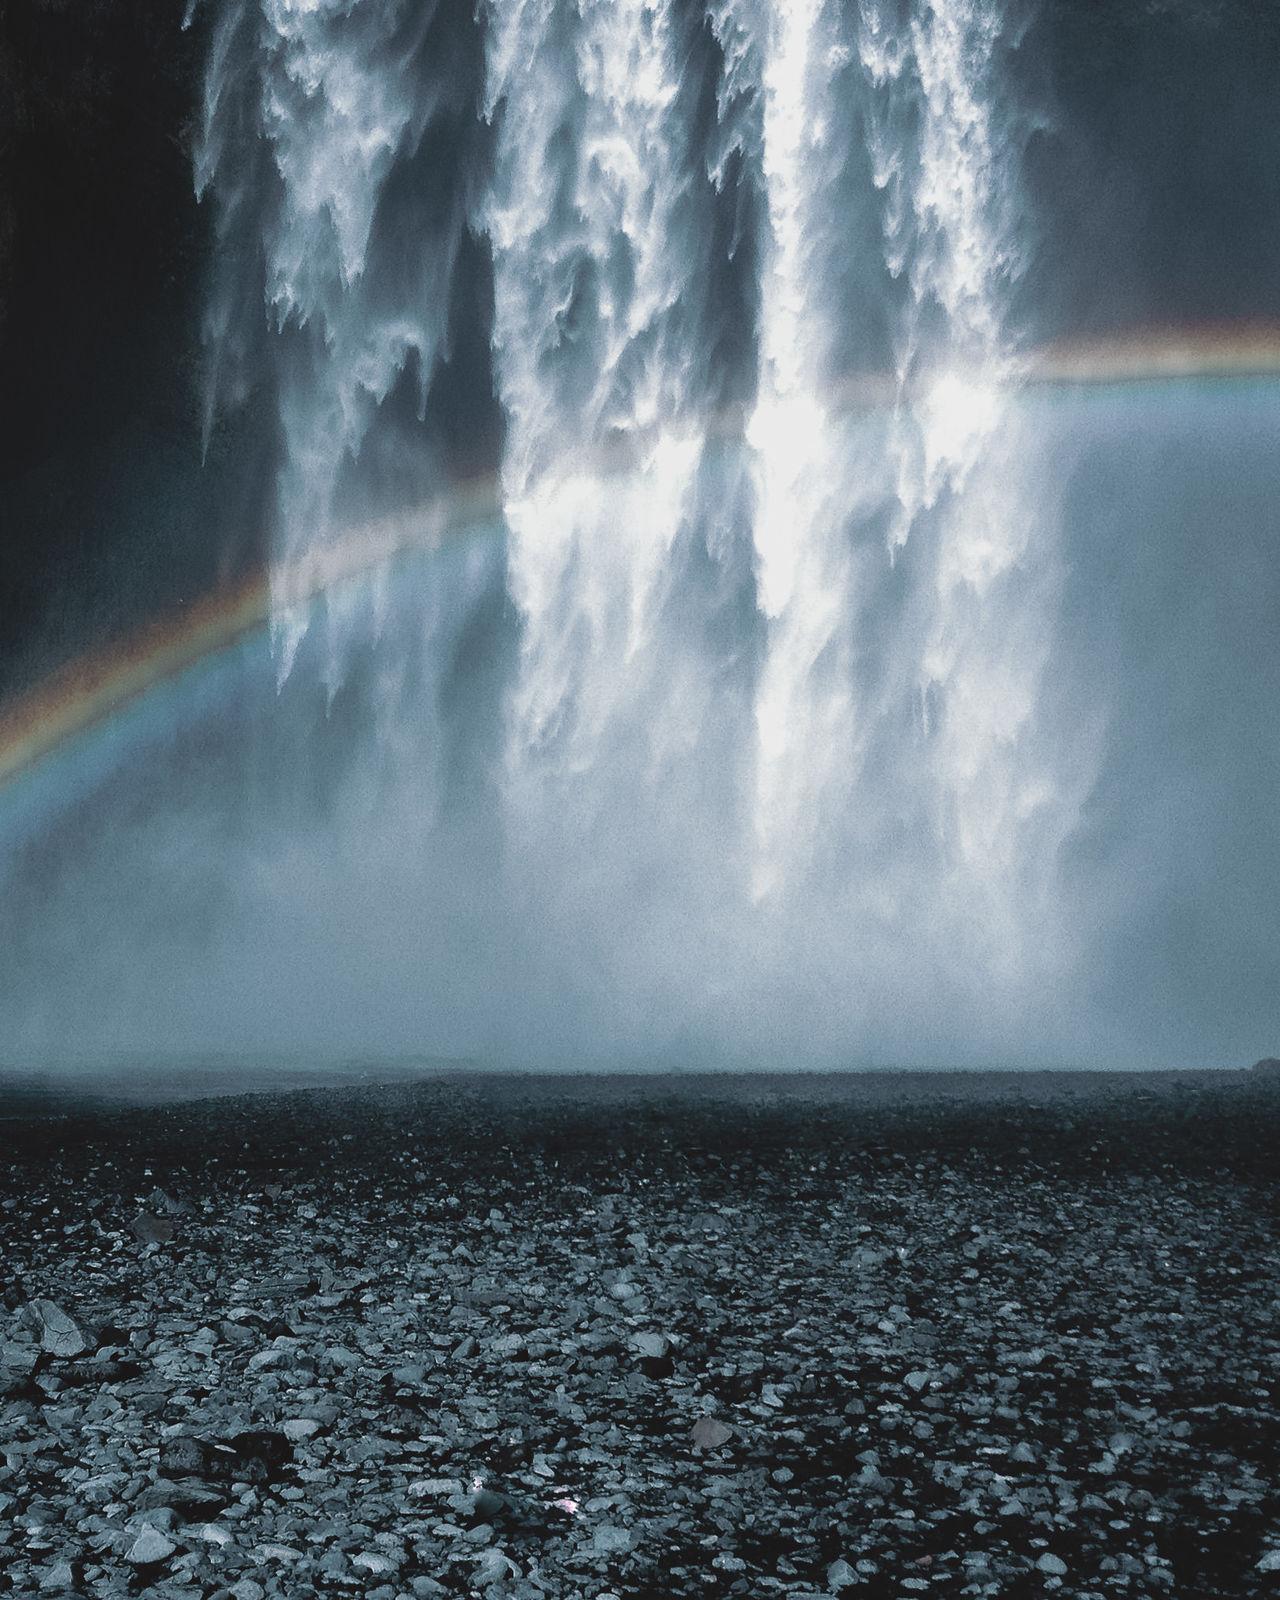 Iceland Waterfall Skogafoss with rainbow Beauty In Nature Day Eye4photography  EyeEm Best Shots EyeEm Gallery EyeEm Nature Lover Horizon Over Water Iceland Landscape Landscape_Collection Nature No People Outdoors Rainbow Scenics Sea Sky Splashing Water